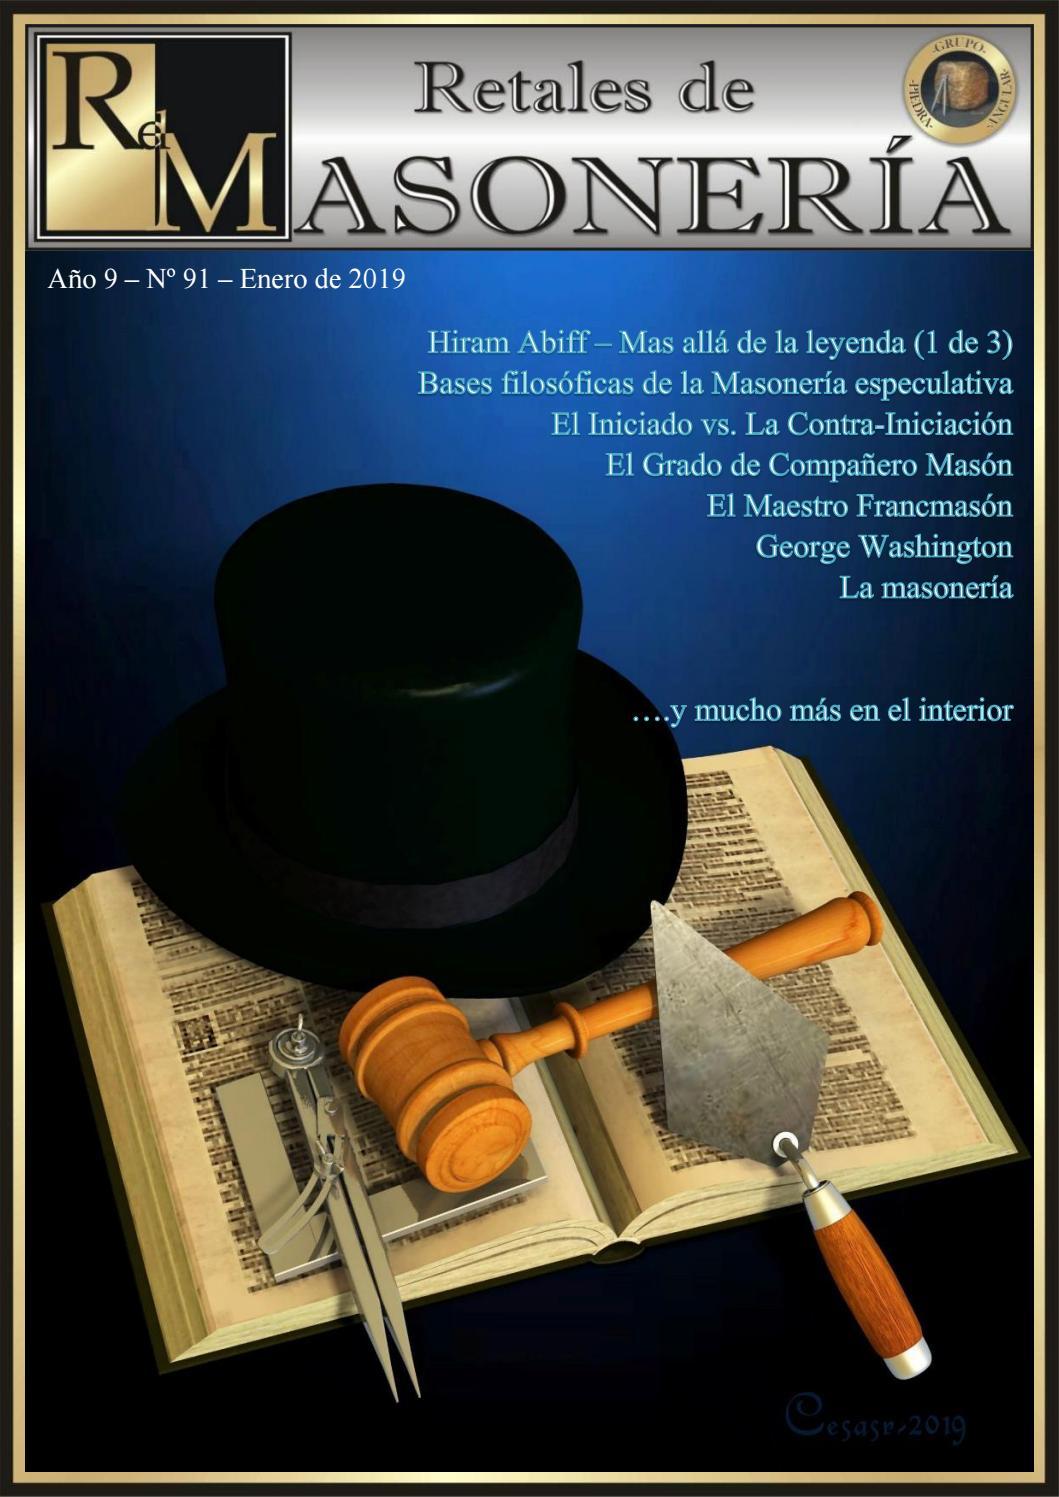 Retales Masoneria Numero 091 - Enero 2019 by Grupo Piedra